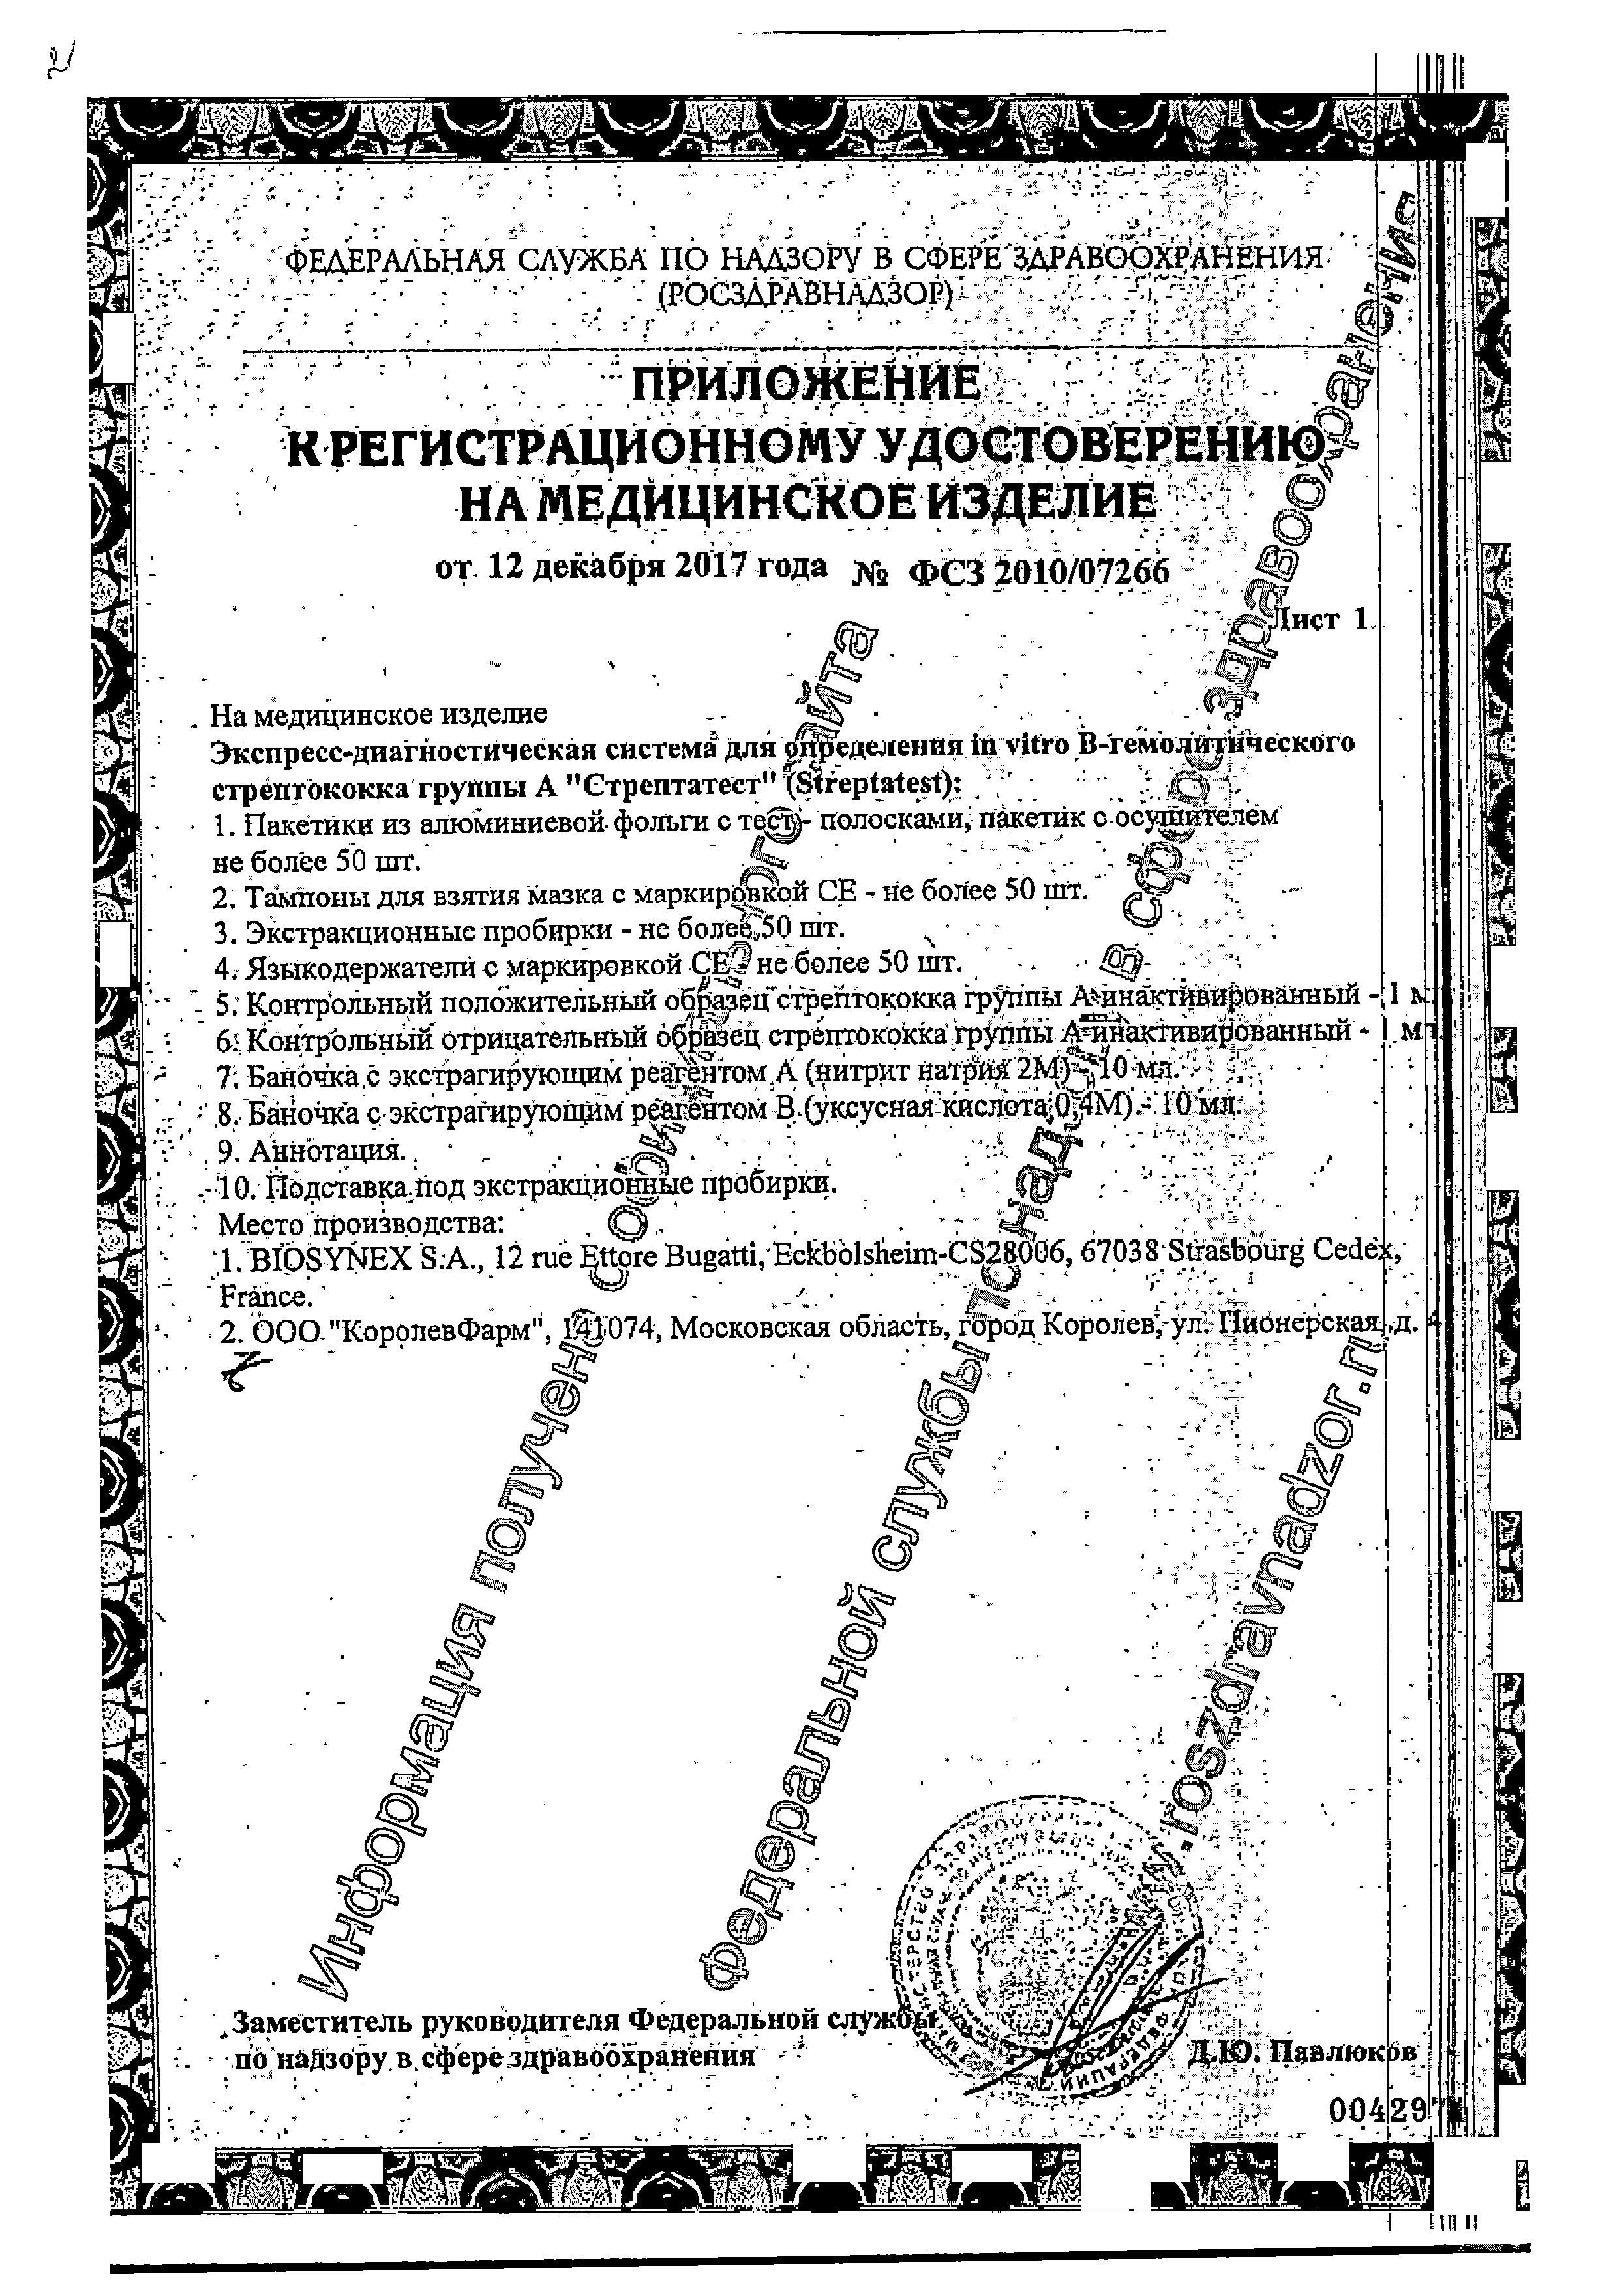 Стрептатест сертификат